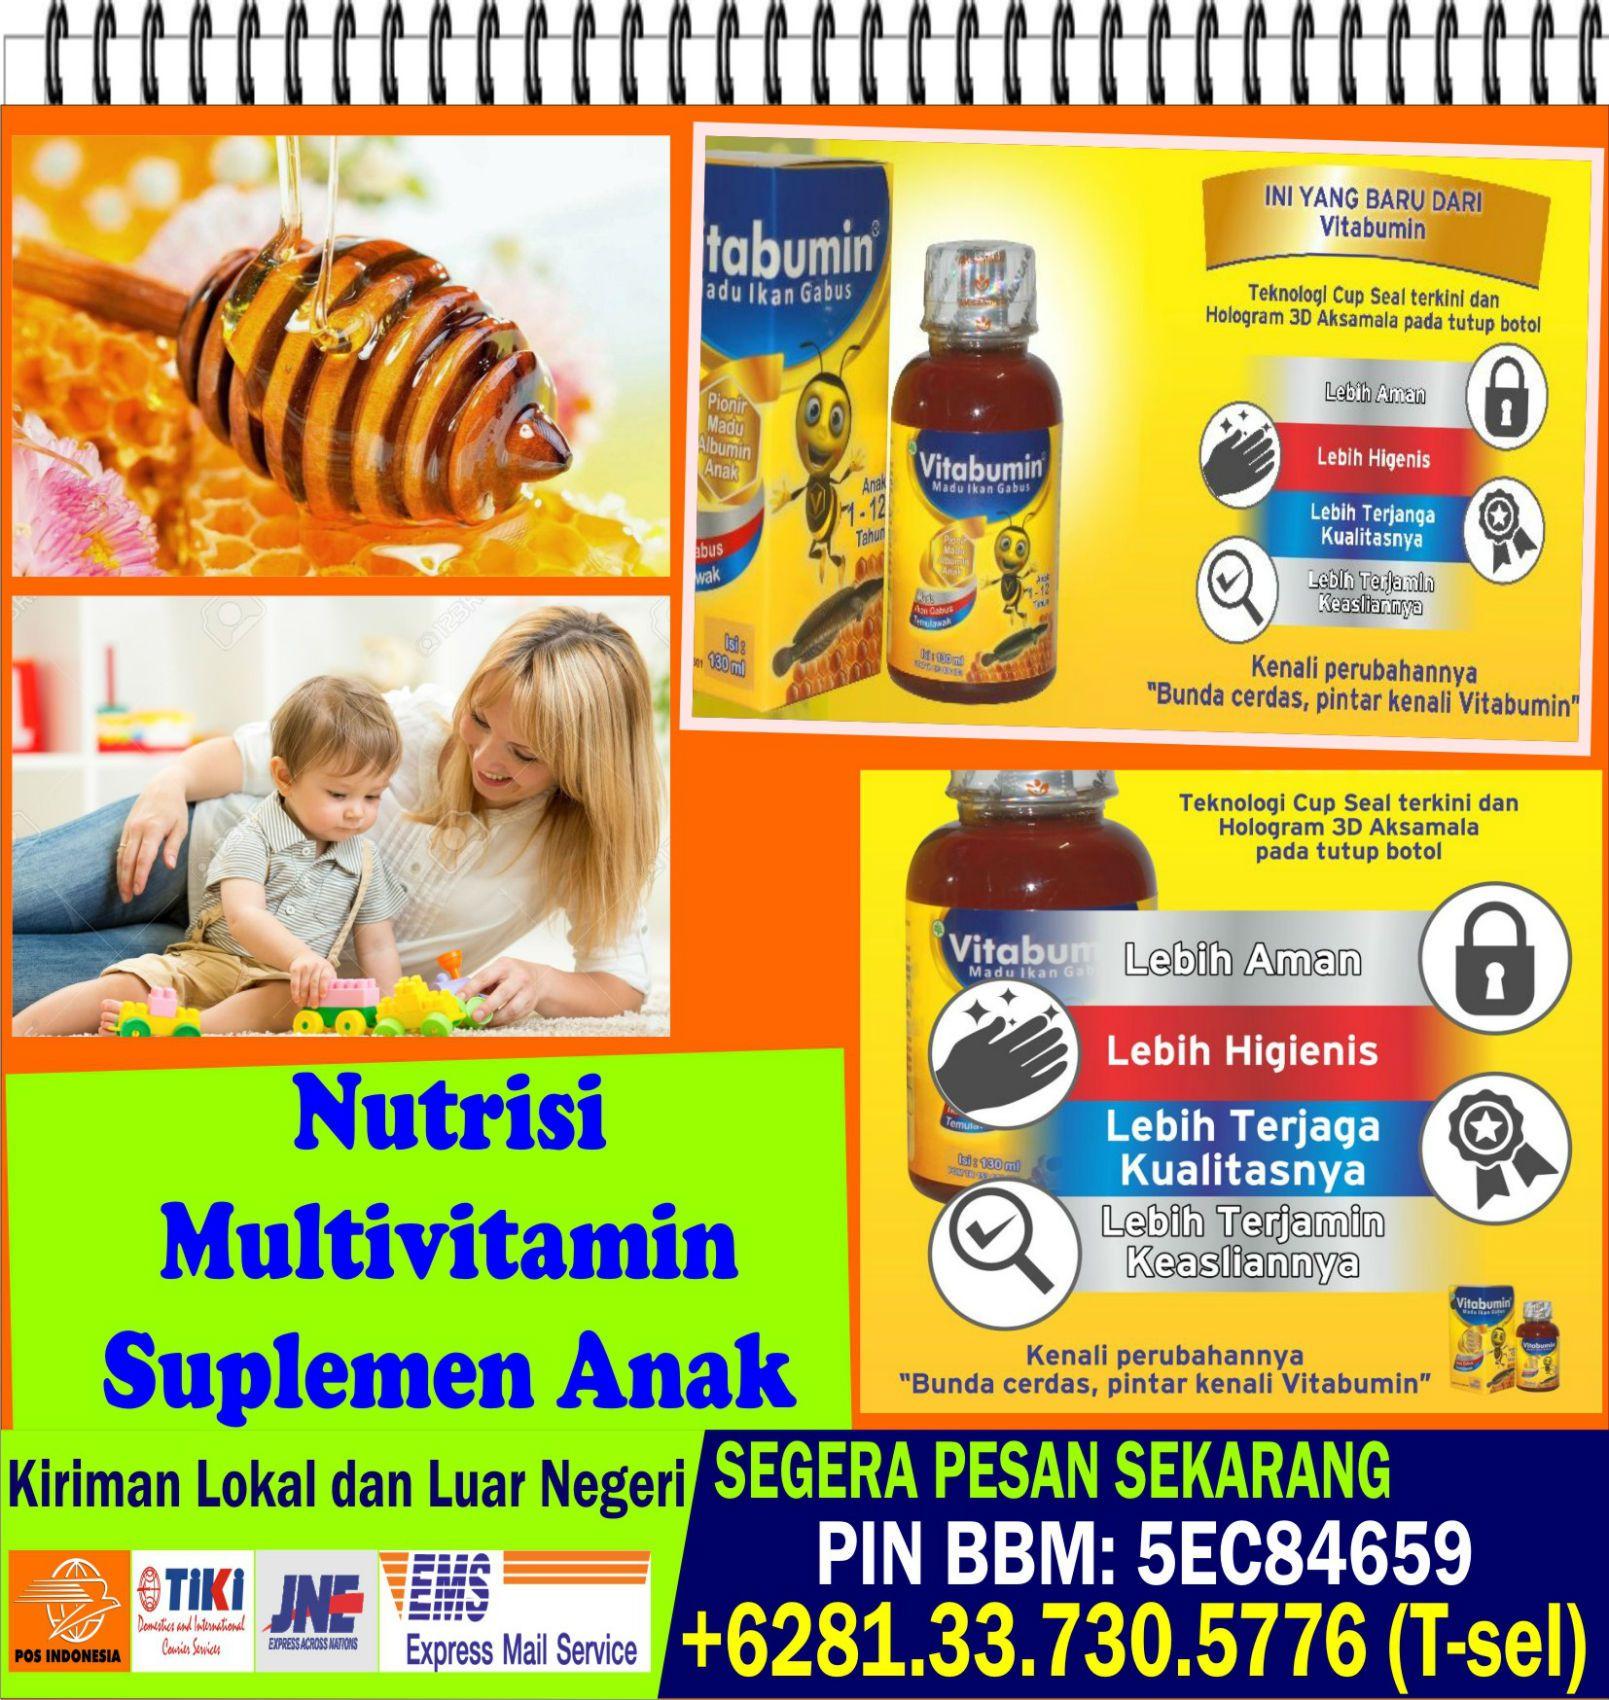 Pin di +6281.33.730.5776 (TSel), Vitamin Imun Tubuh